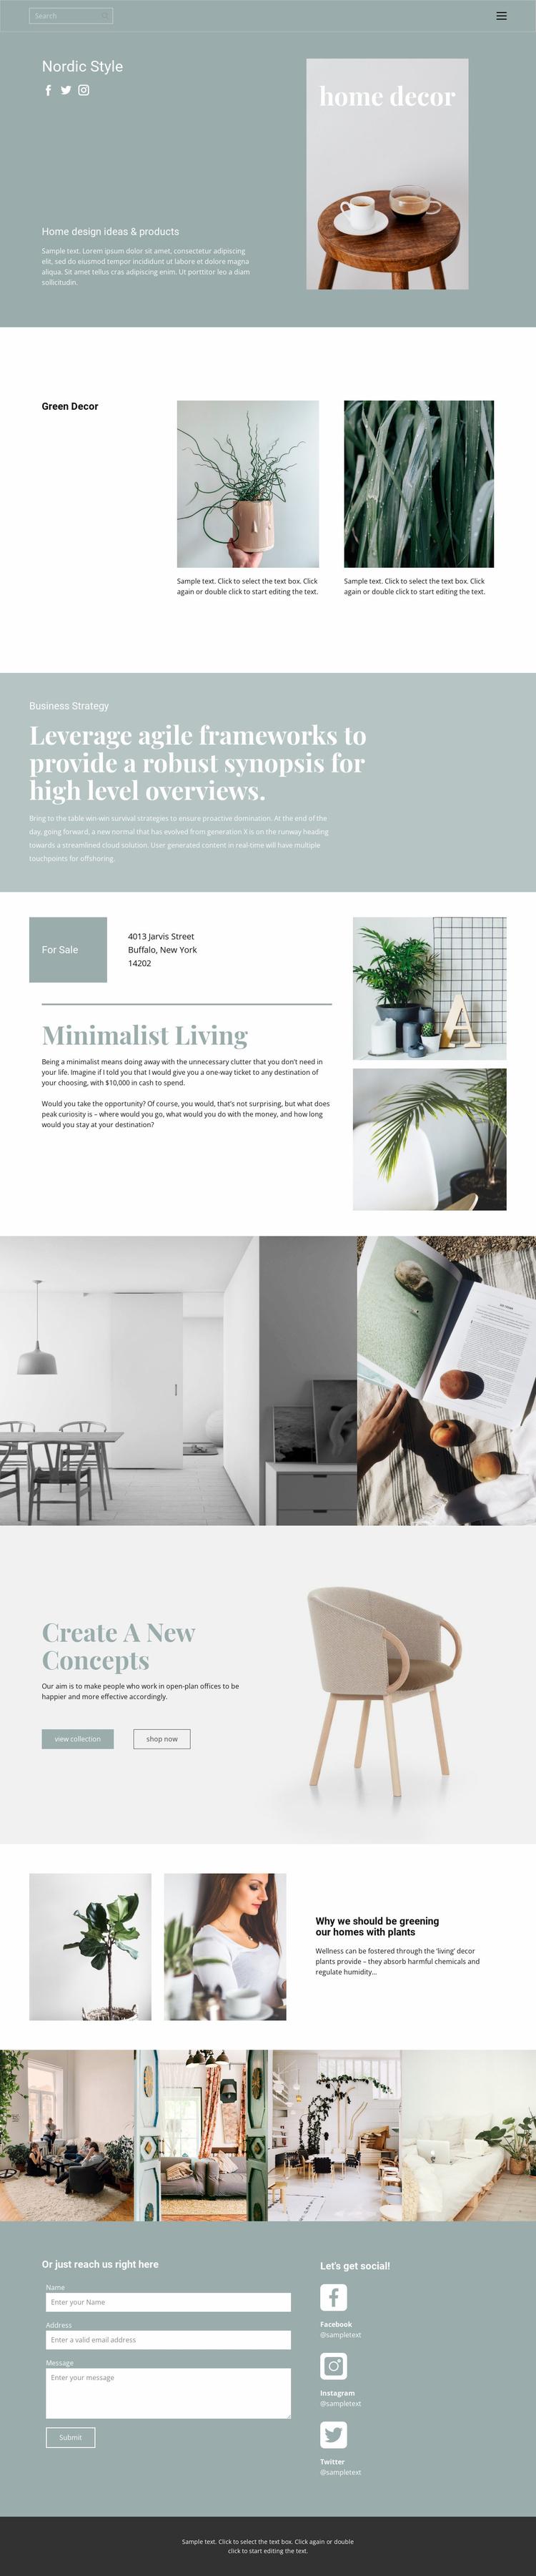 Help interior designer Landing Page